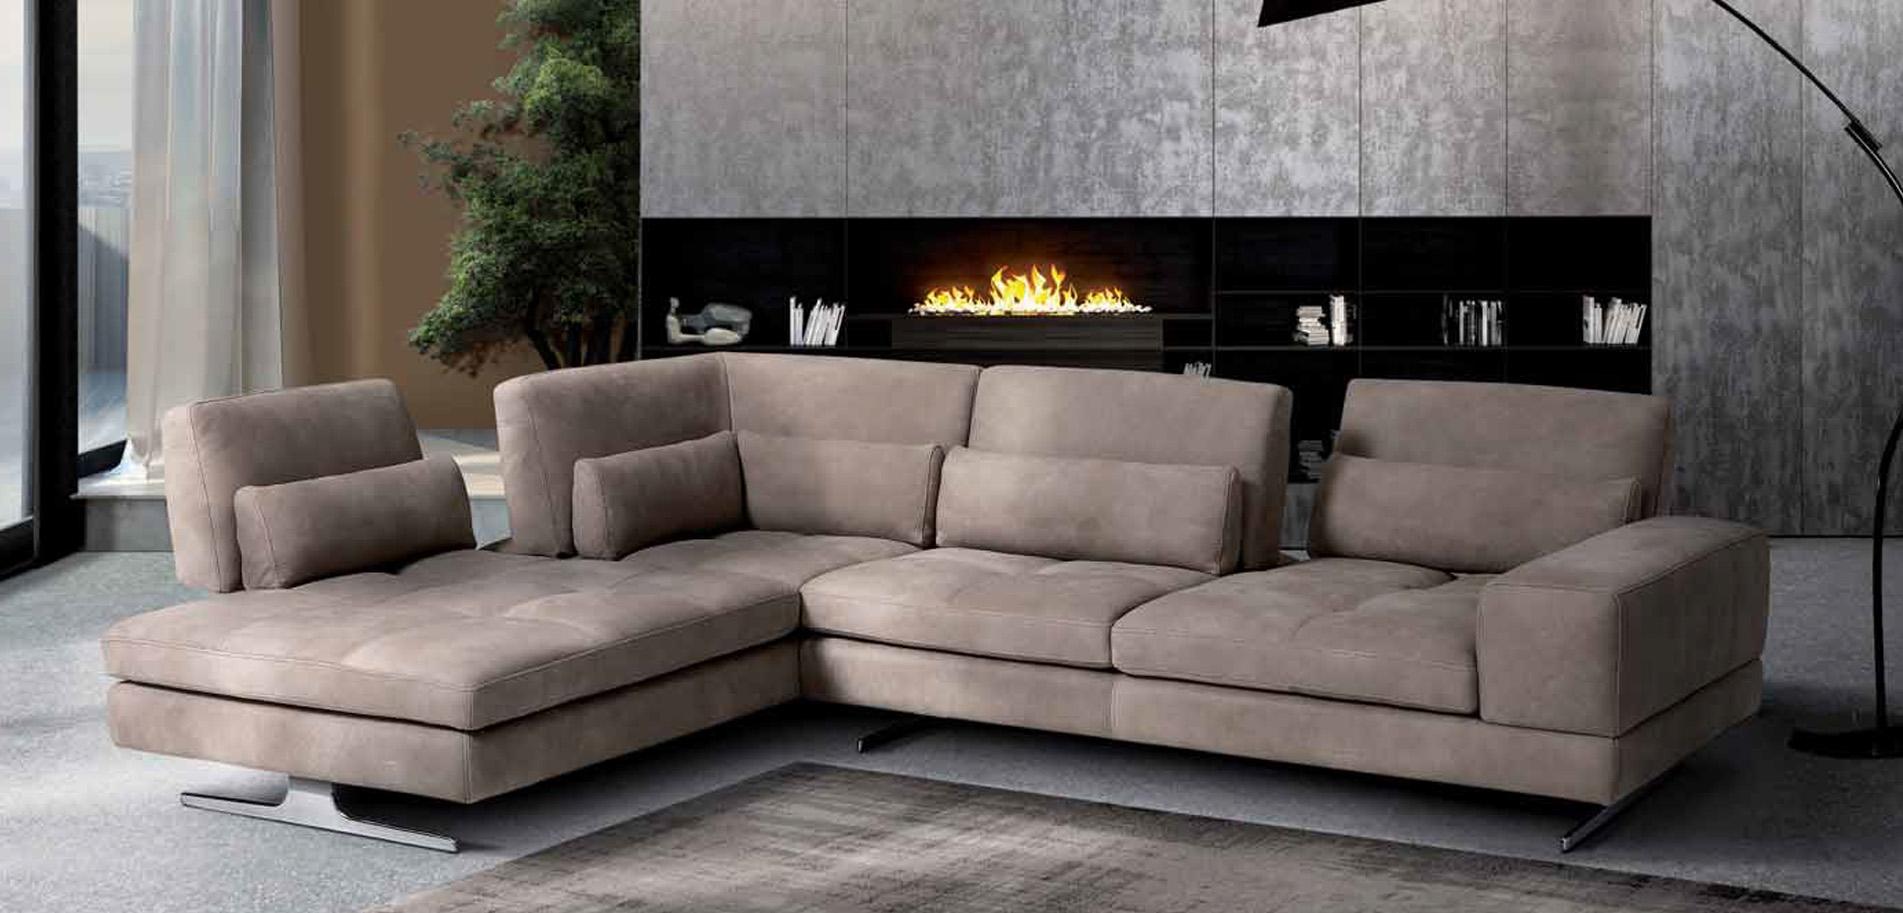 Max Divani Leather Recliner Sofa